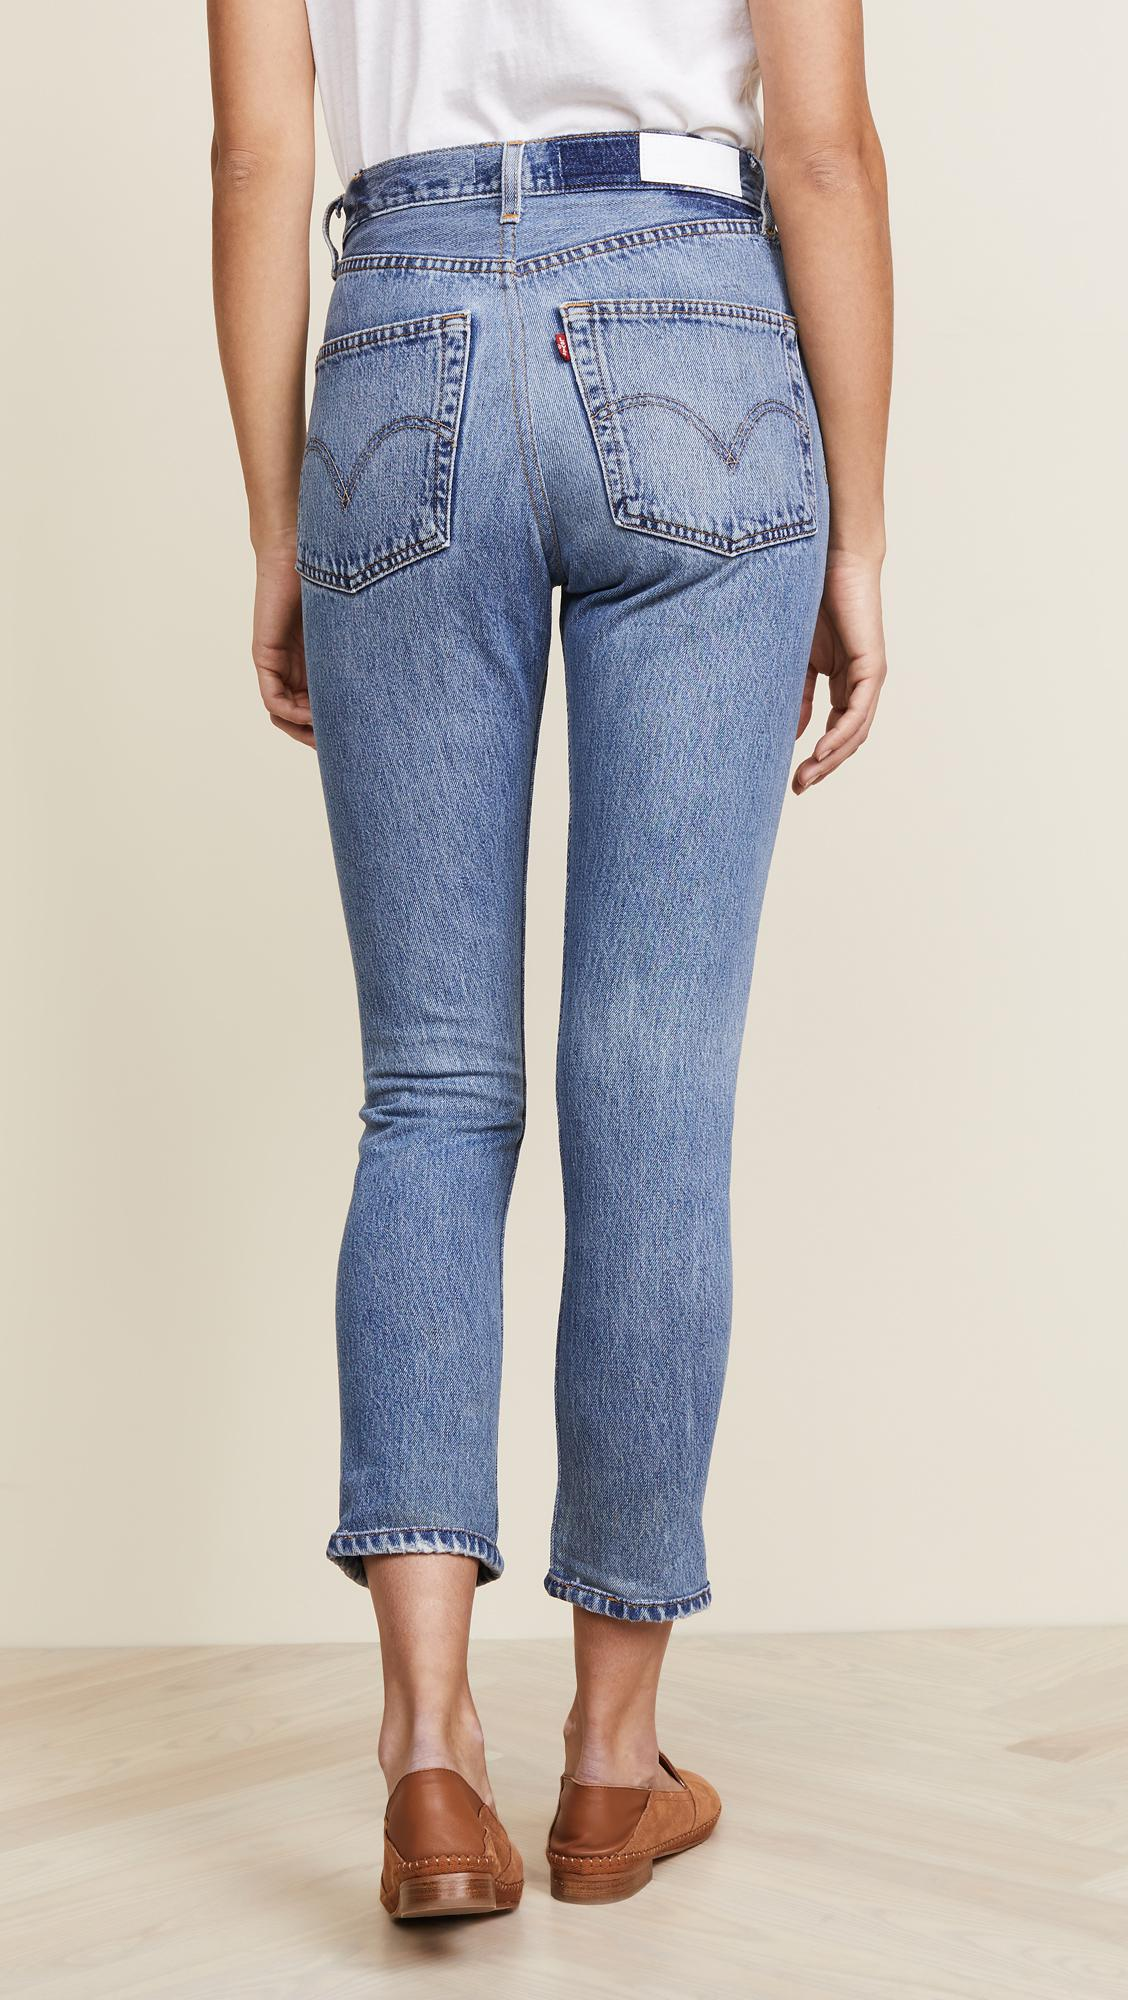 a34443d3eb6b2 Re done - Blue X Levi s High Rise Ankle Crop Jeans - Lyst. View fullscreen